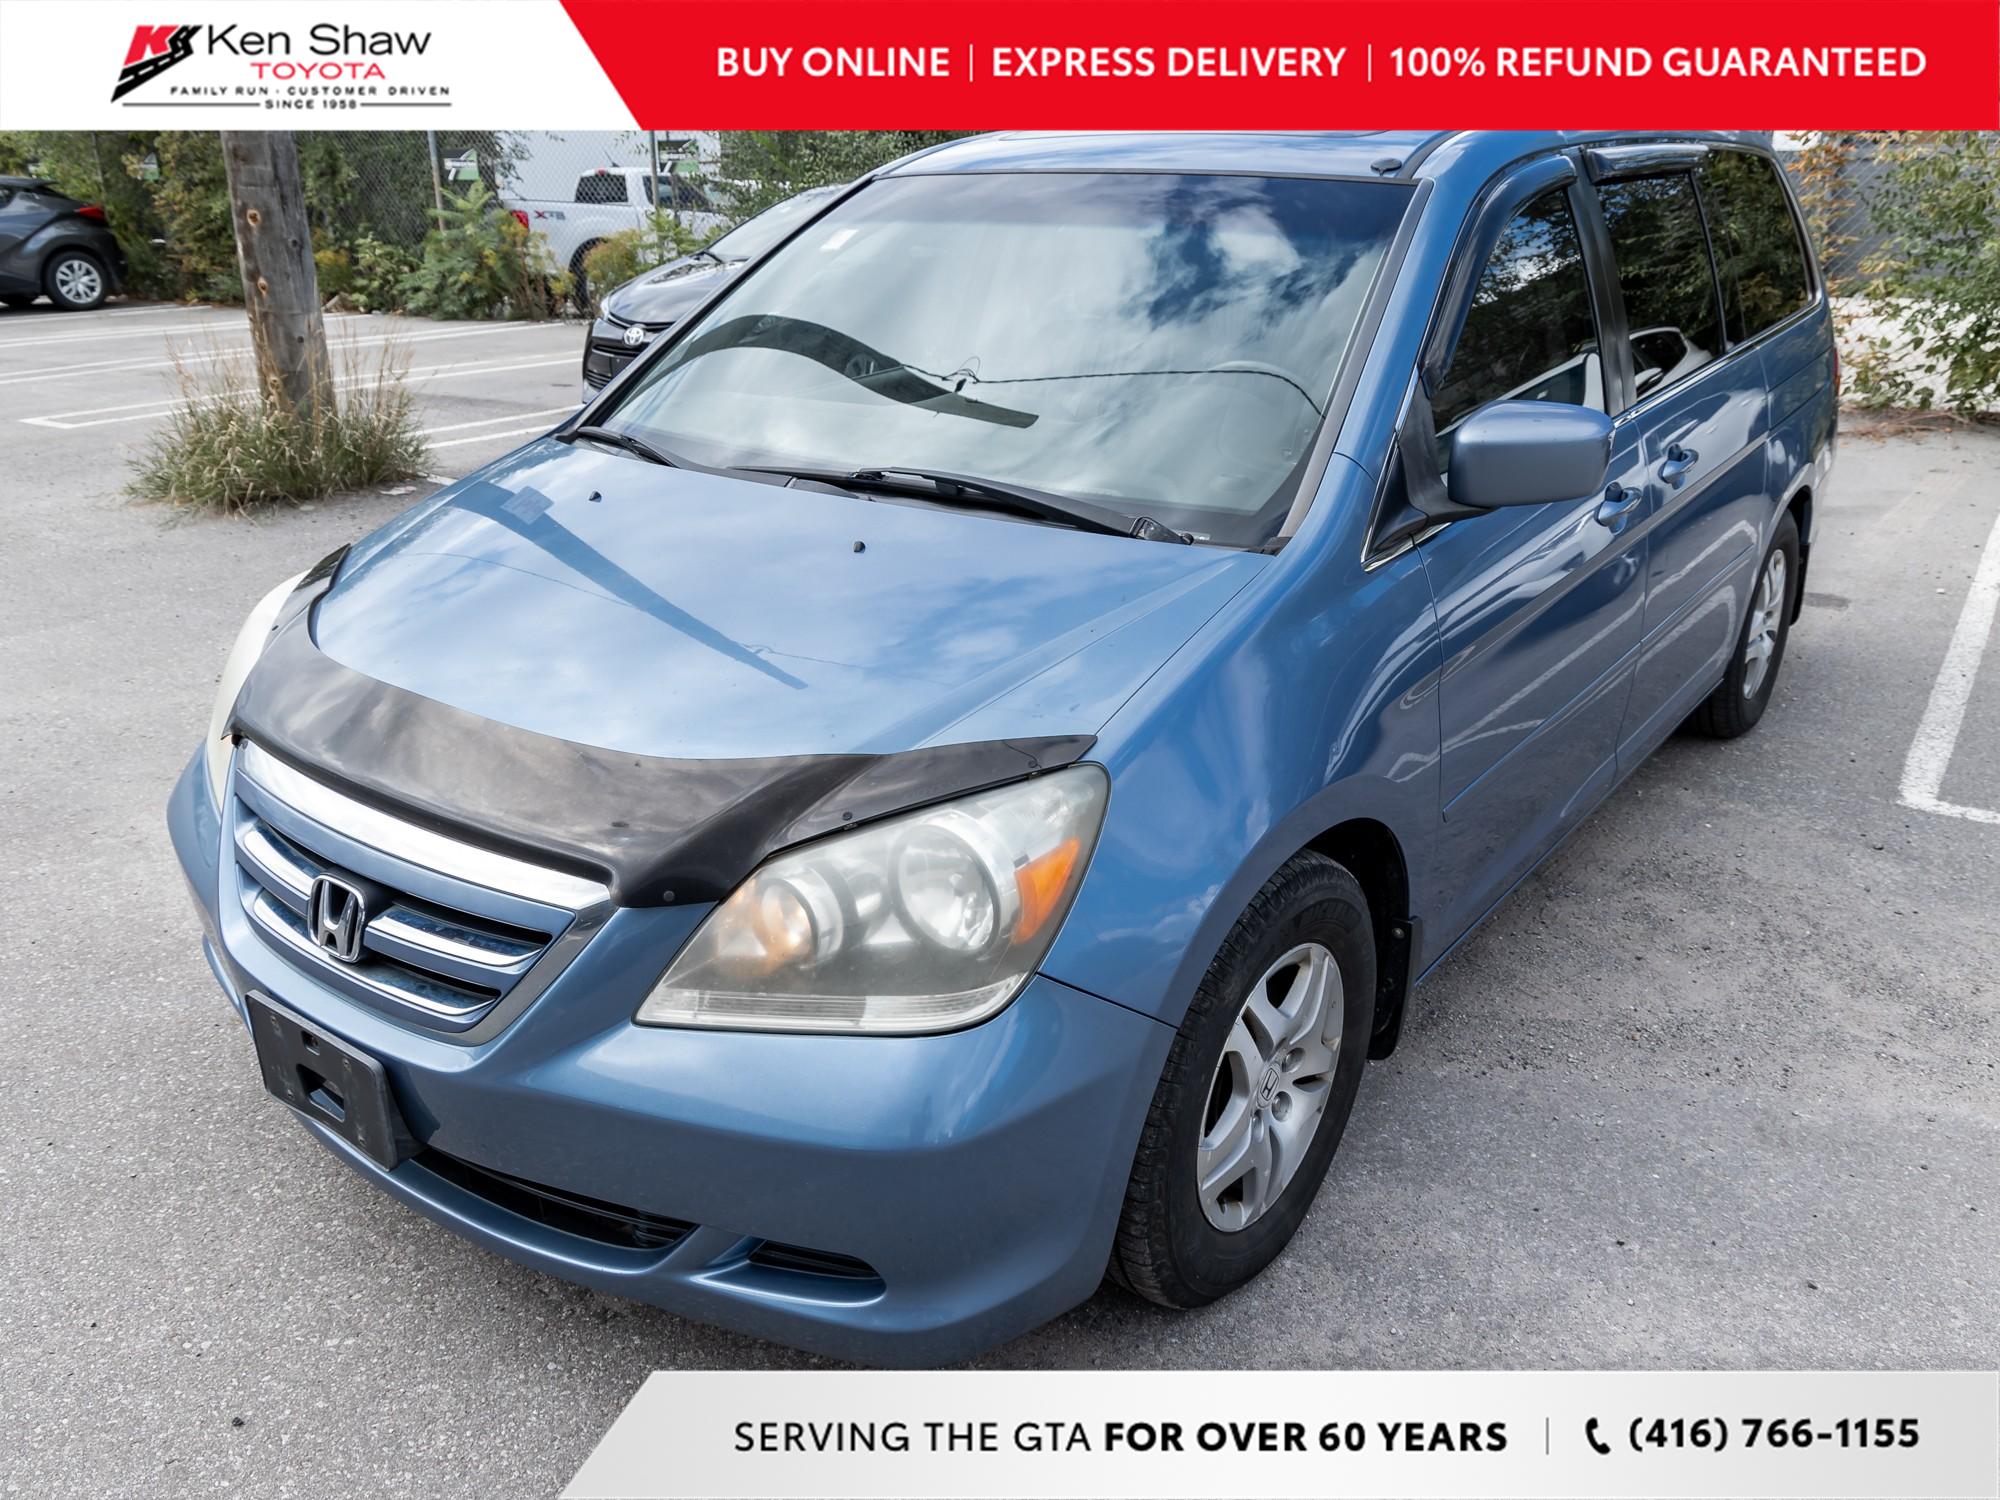 used 2007 Honda Odyssey car, priced at $3,995